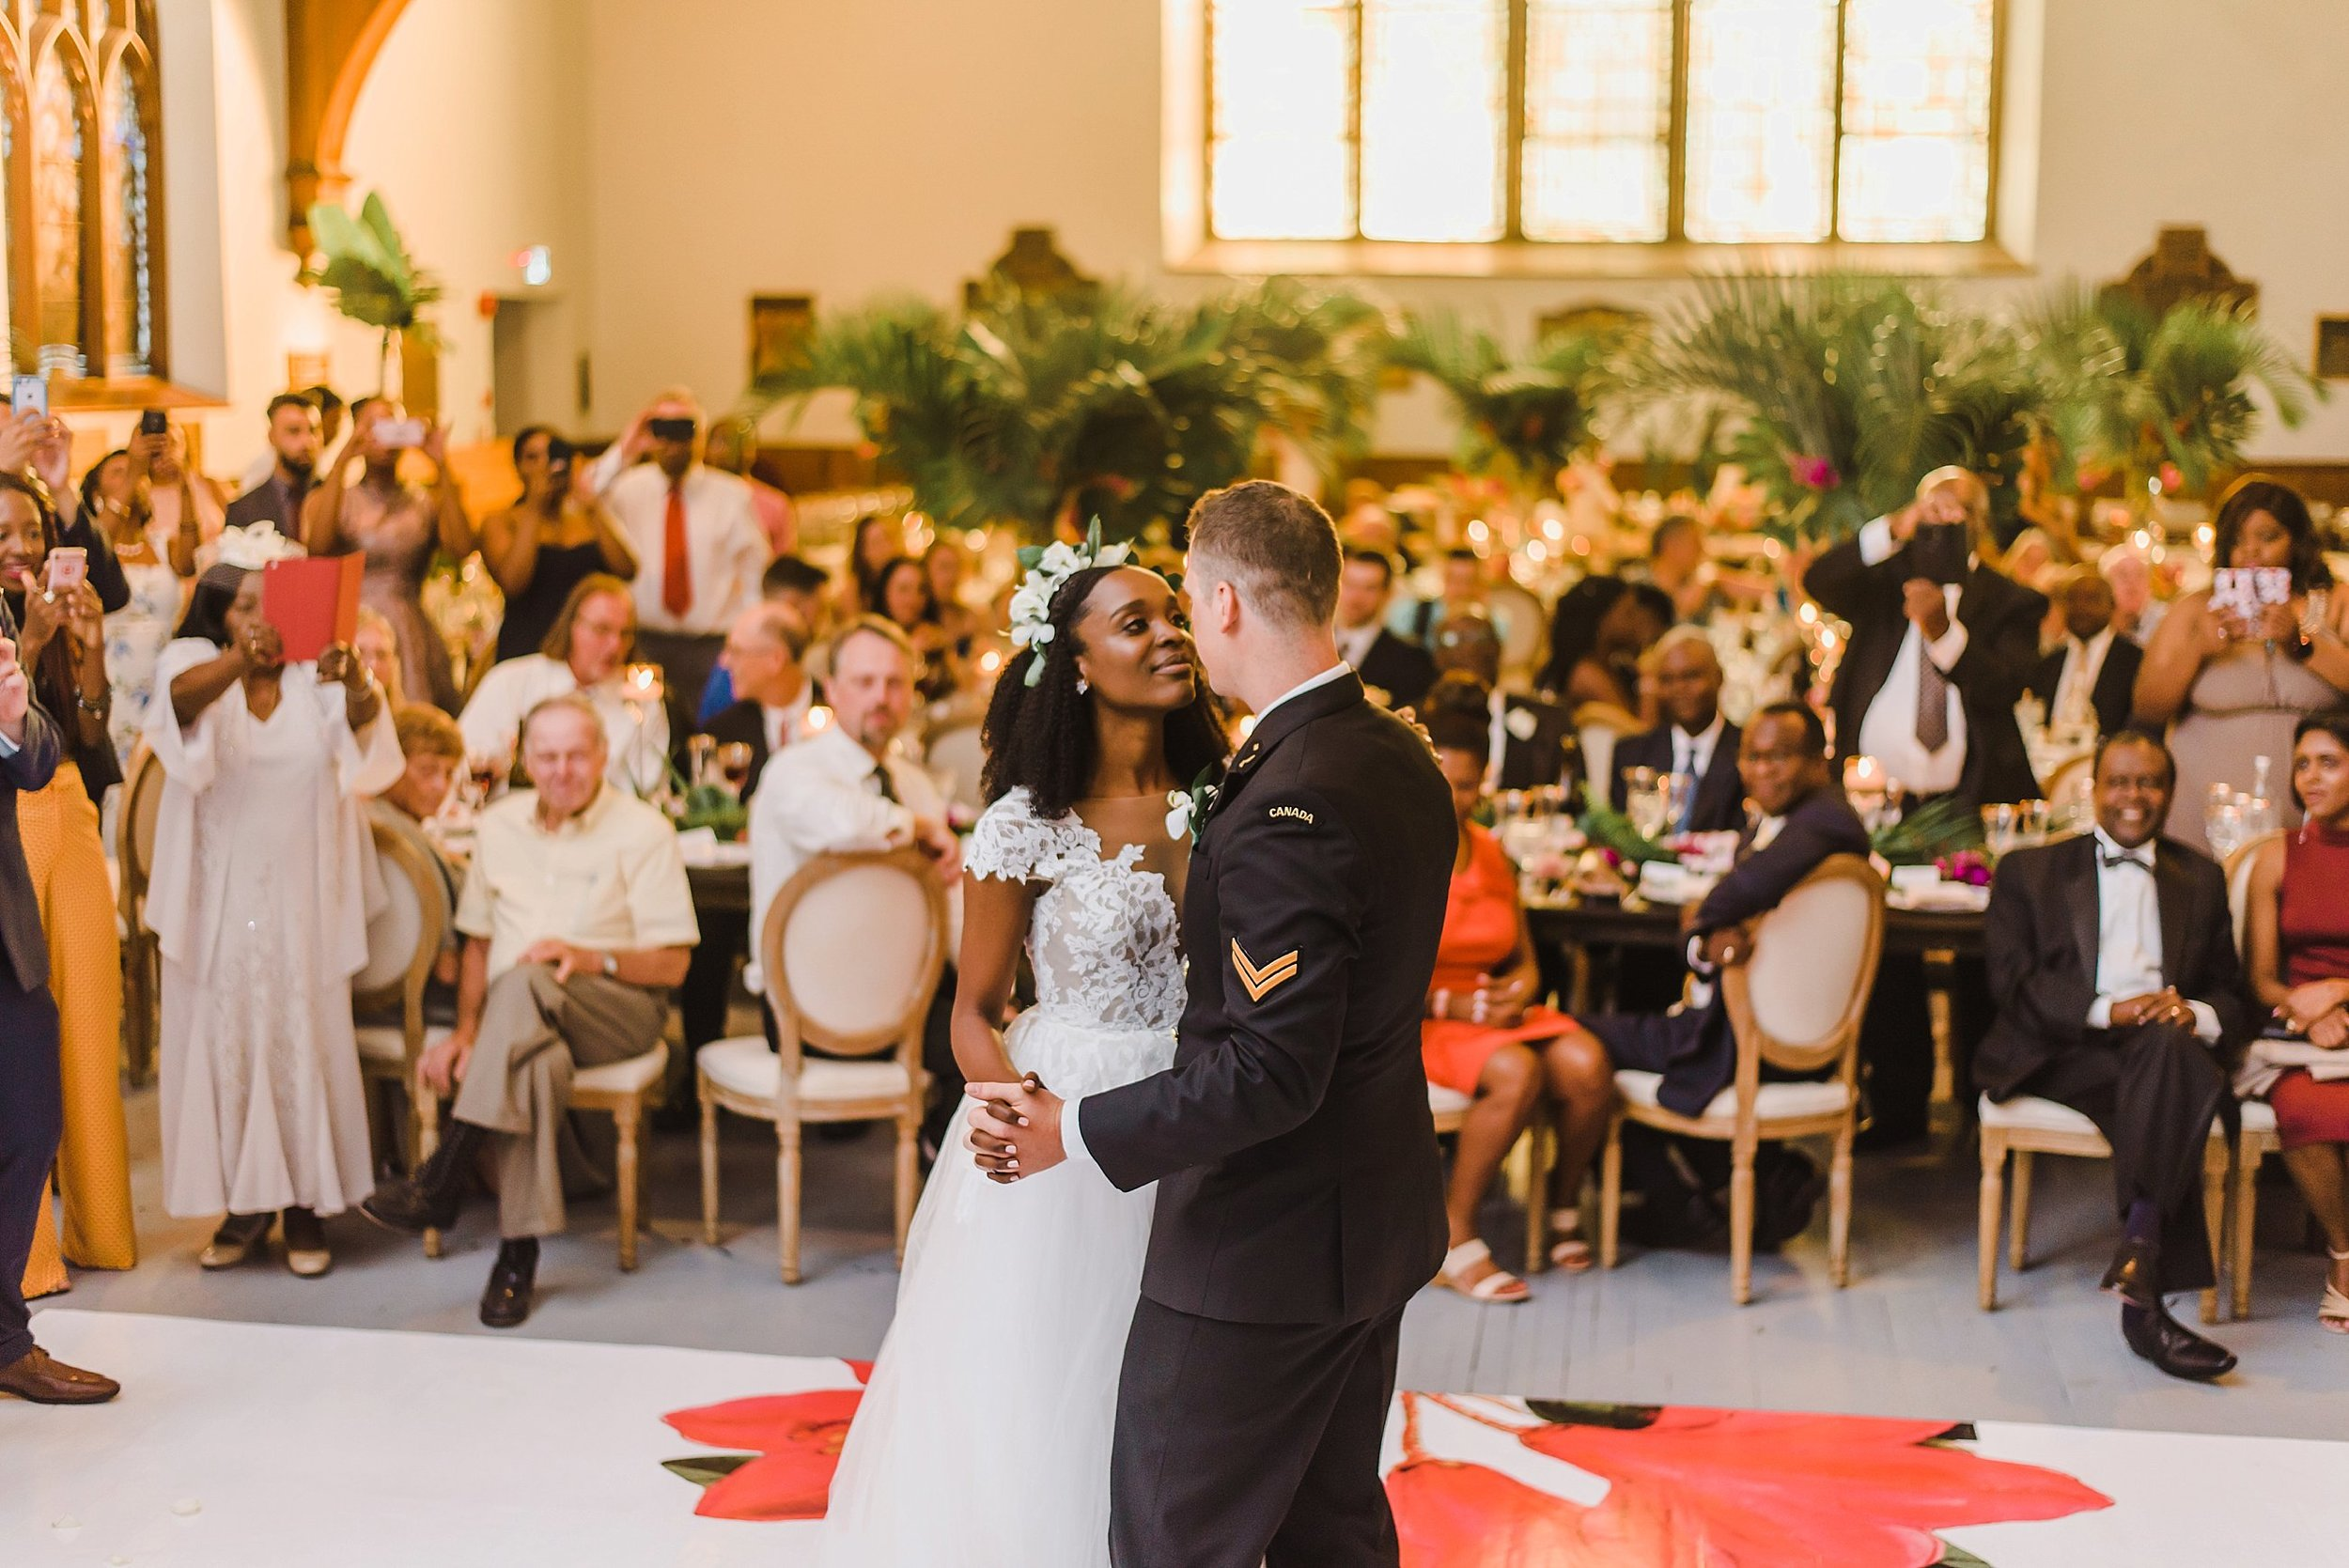 light airy indie fine art ottawa wedding photographer | Ali and Batoul Photography_1034.jpg